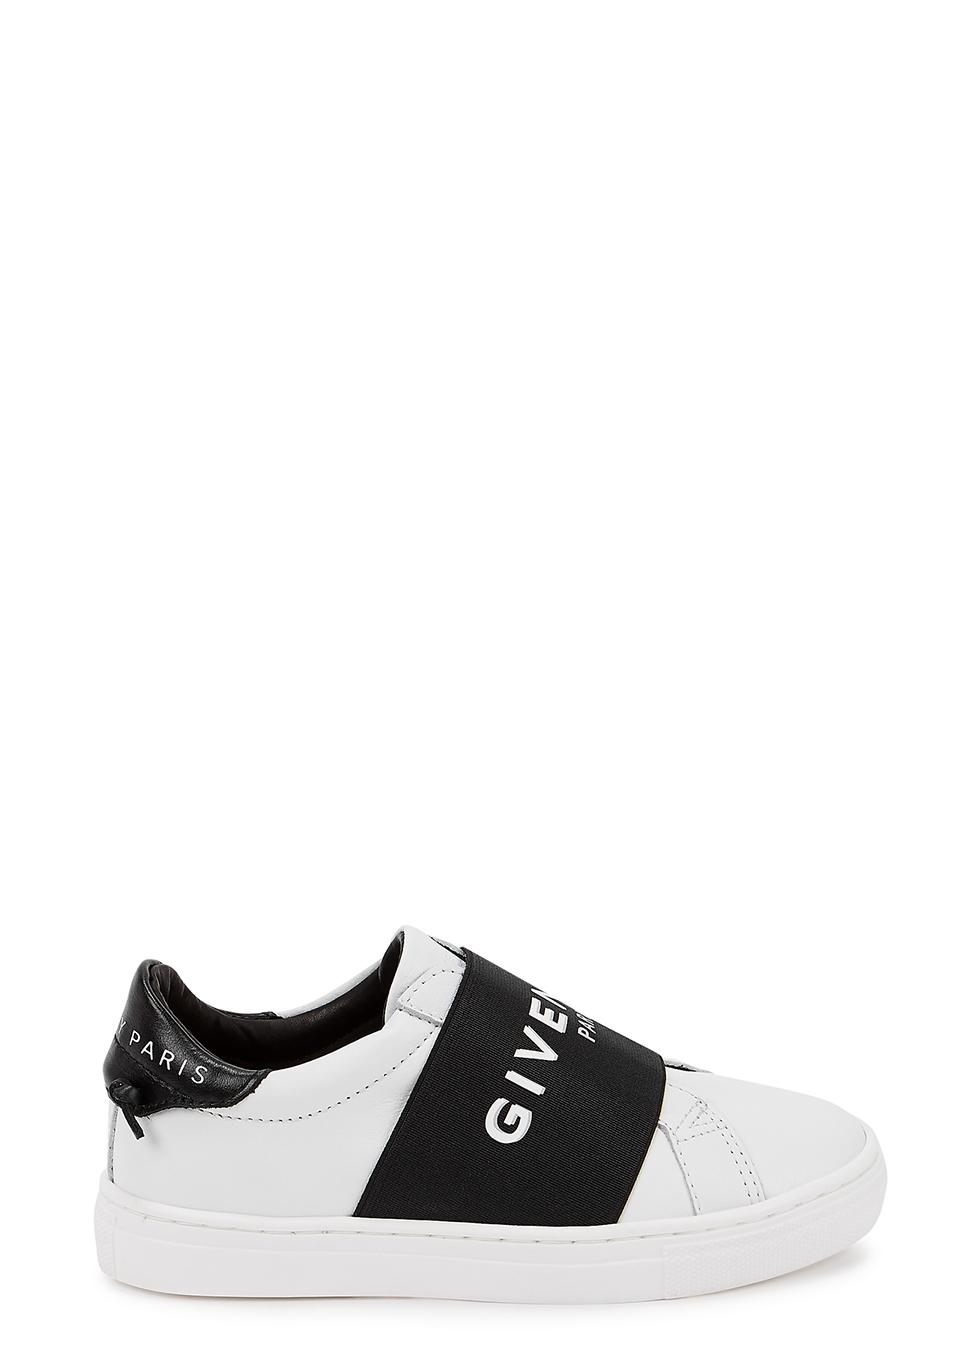 White logo leather sneakers (IT28-IT34)